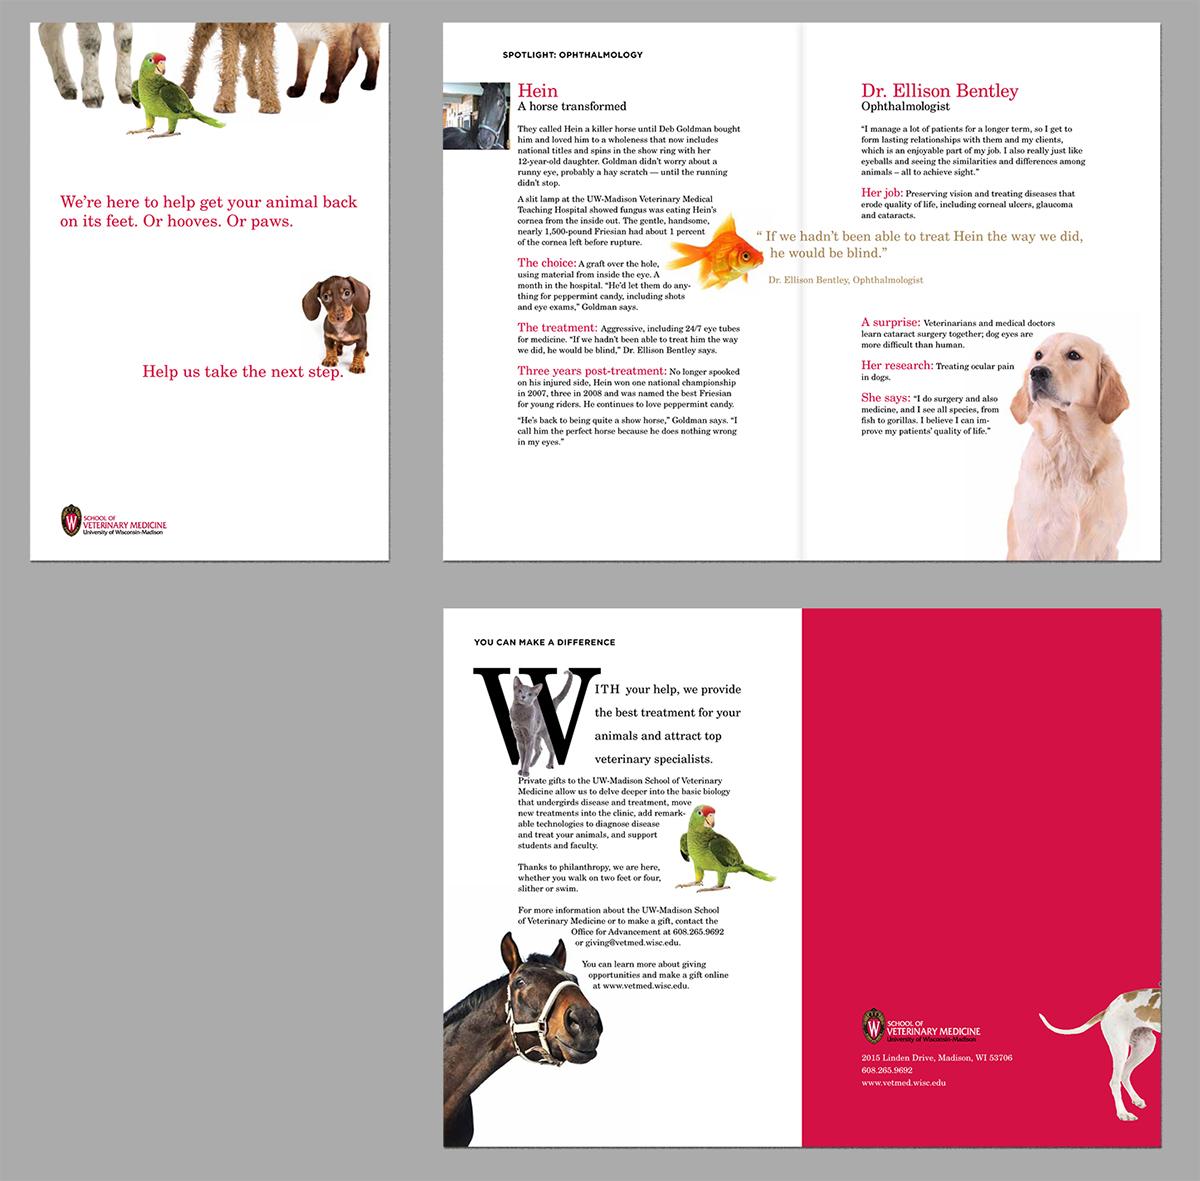 concept Philanthropy  research veterinary University